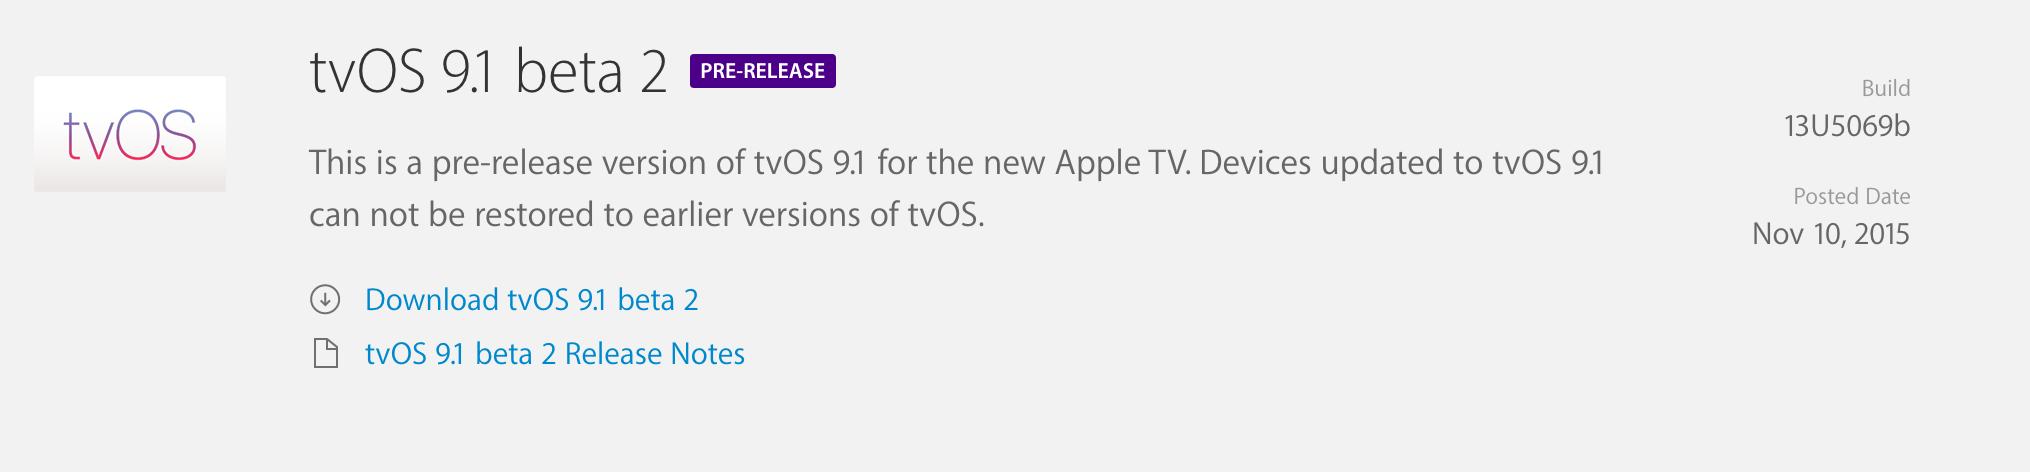 tvOS 9.1 beta 2